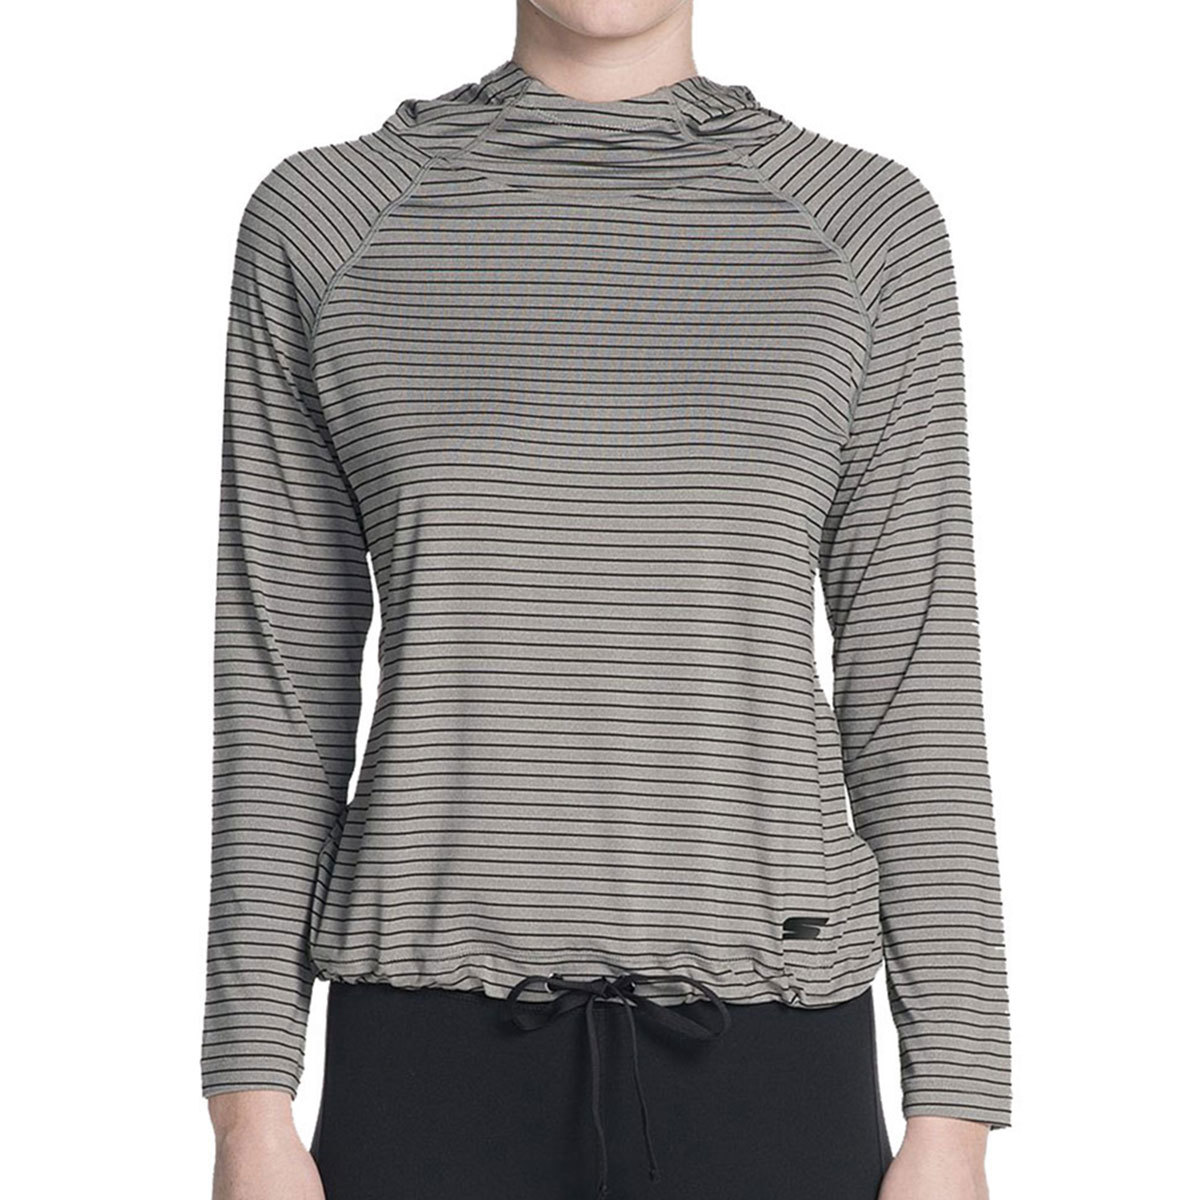 Skechers Women's Chakra Stripe Long-Sleeve Pullover Top - Black, S